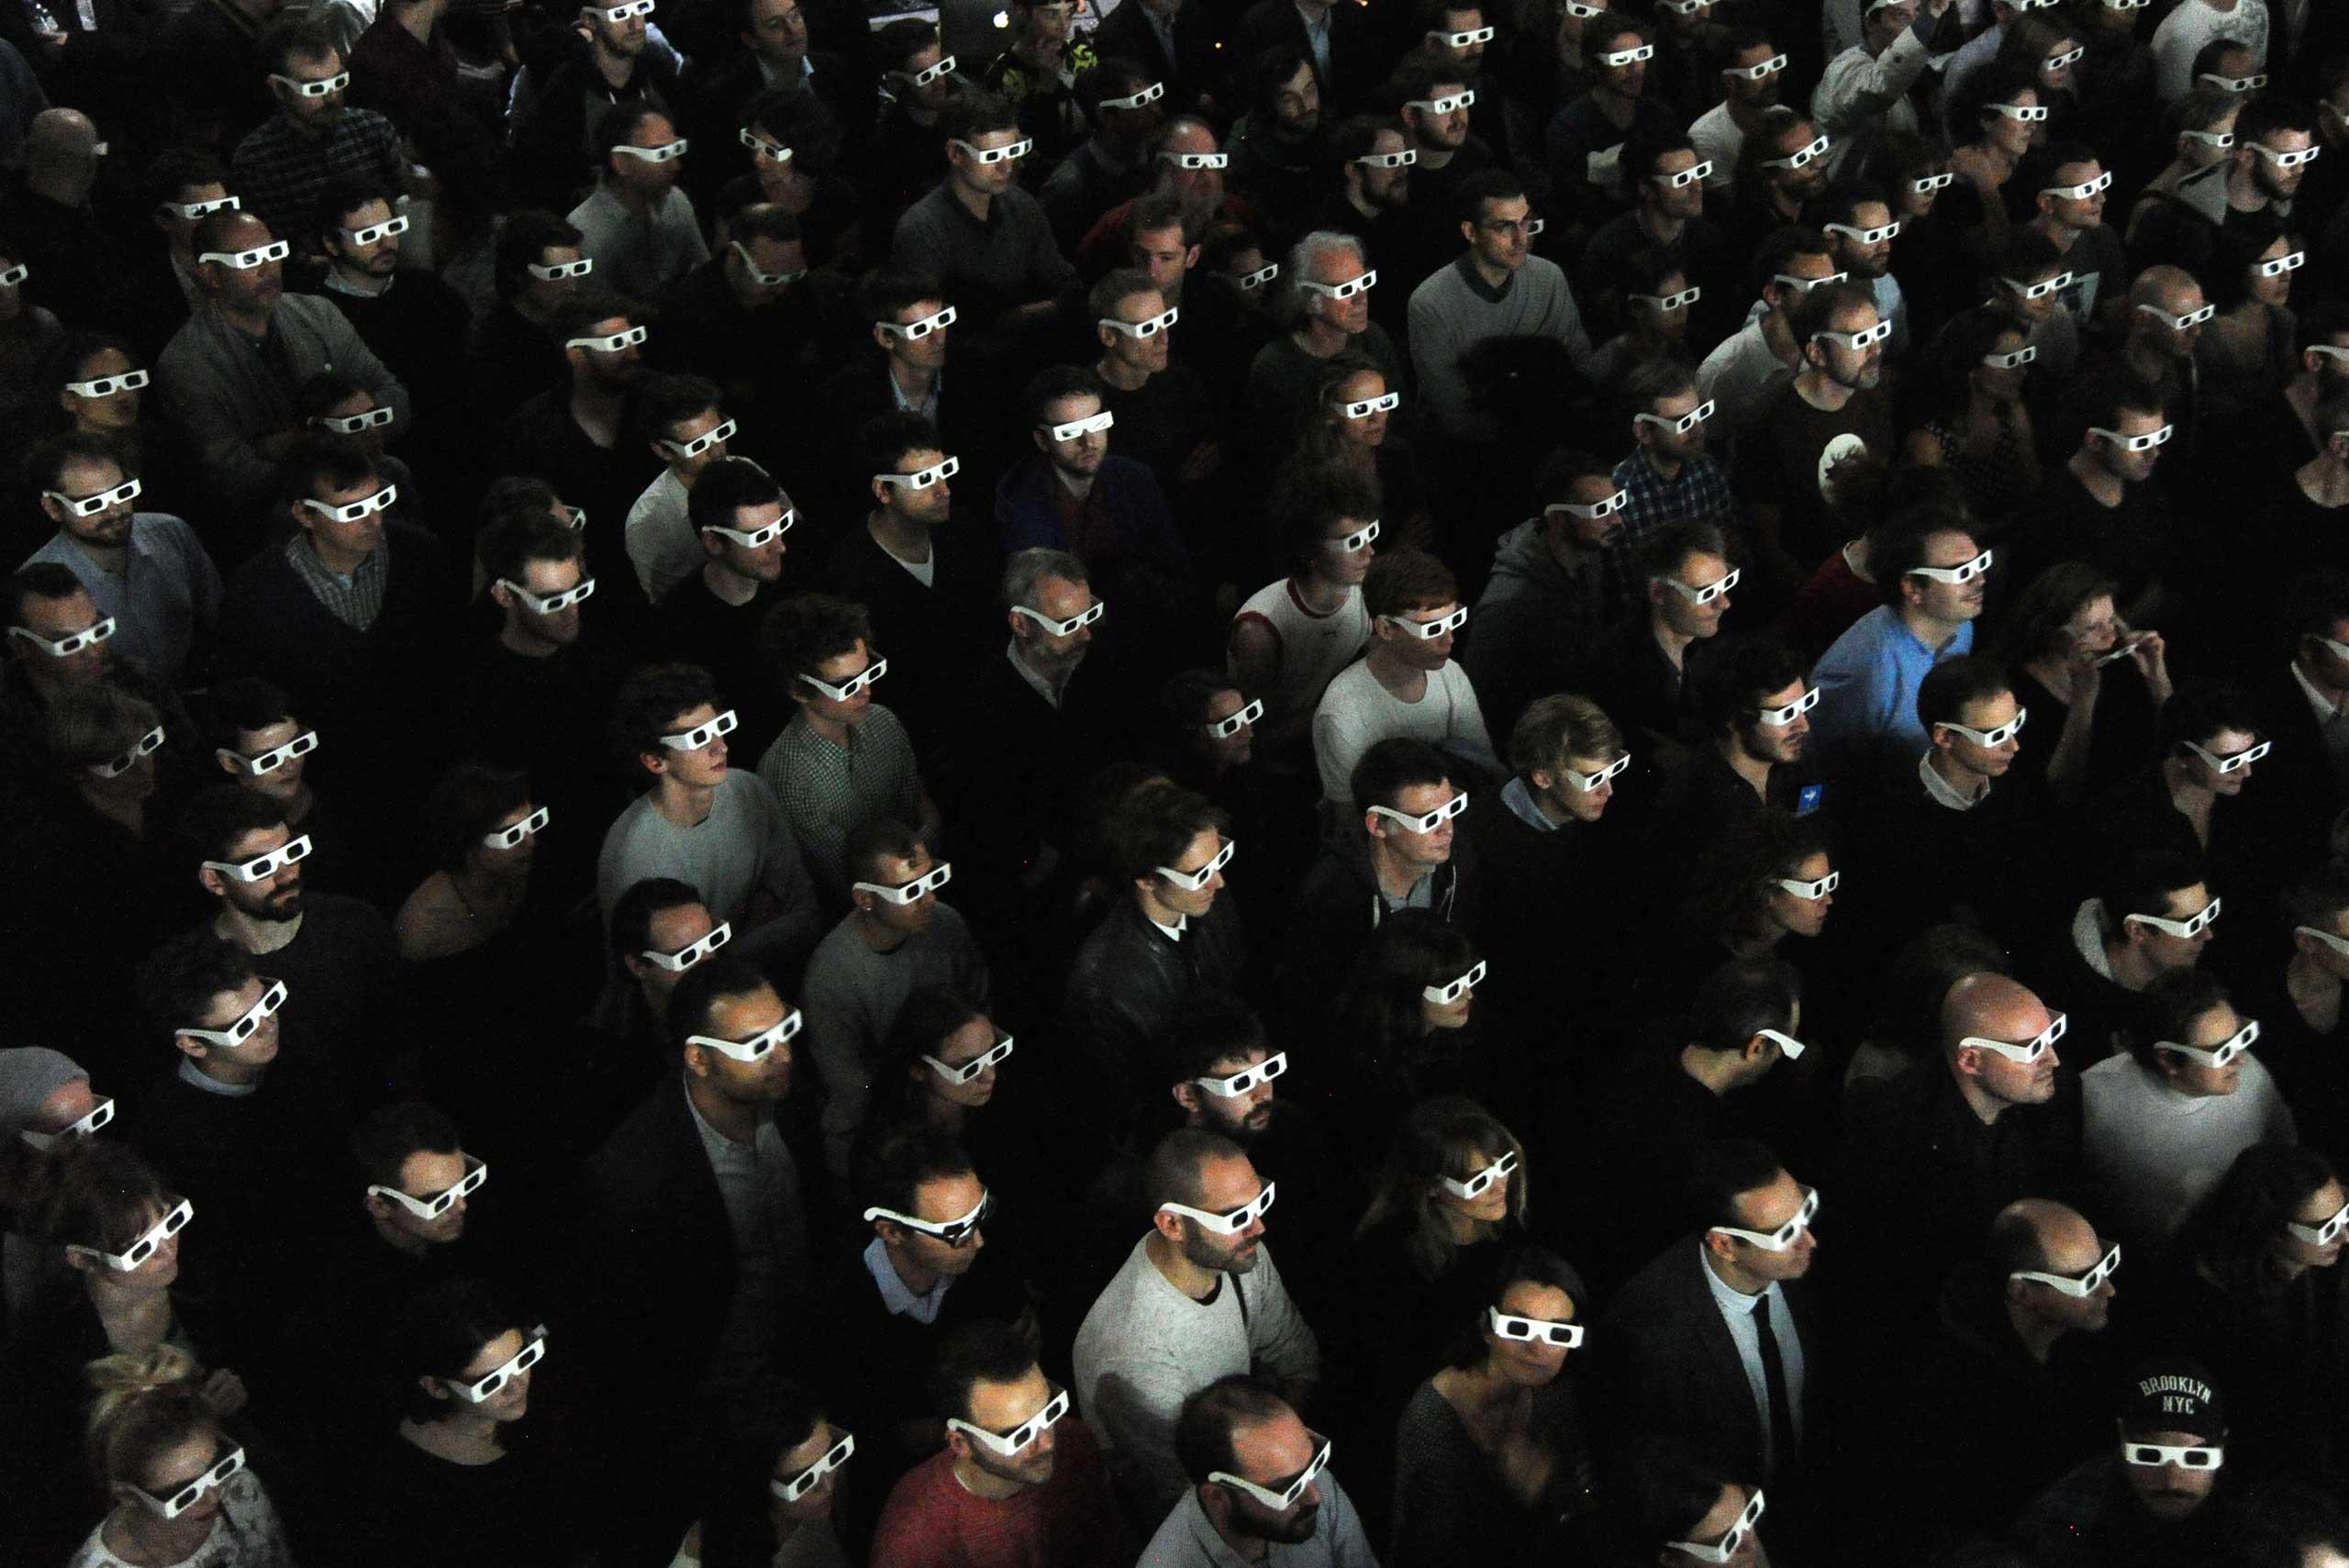 Nov. 6, 2014. Spectators wearing 3D glasses watch the live concert of the German band Kraftwerk at the Louis Vuitton Art Foundation in Paris.